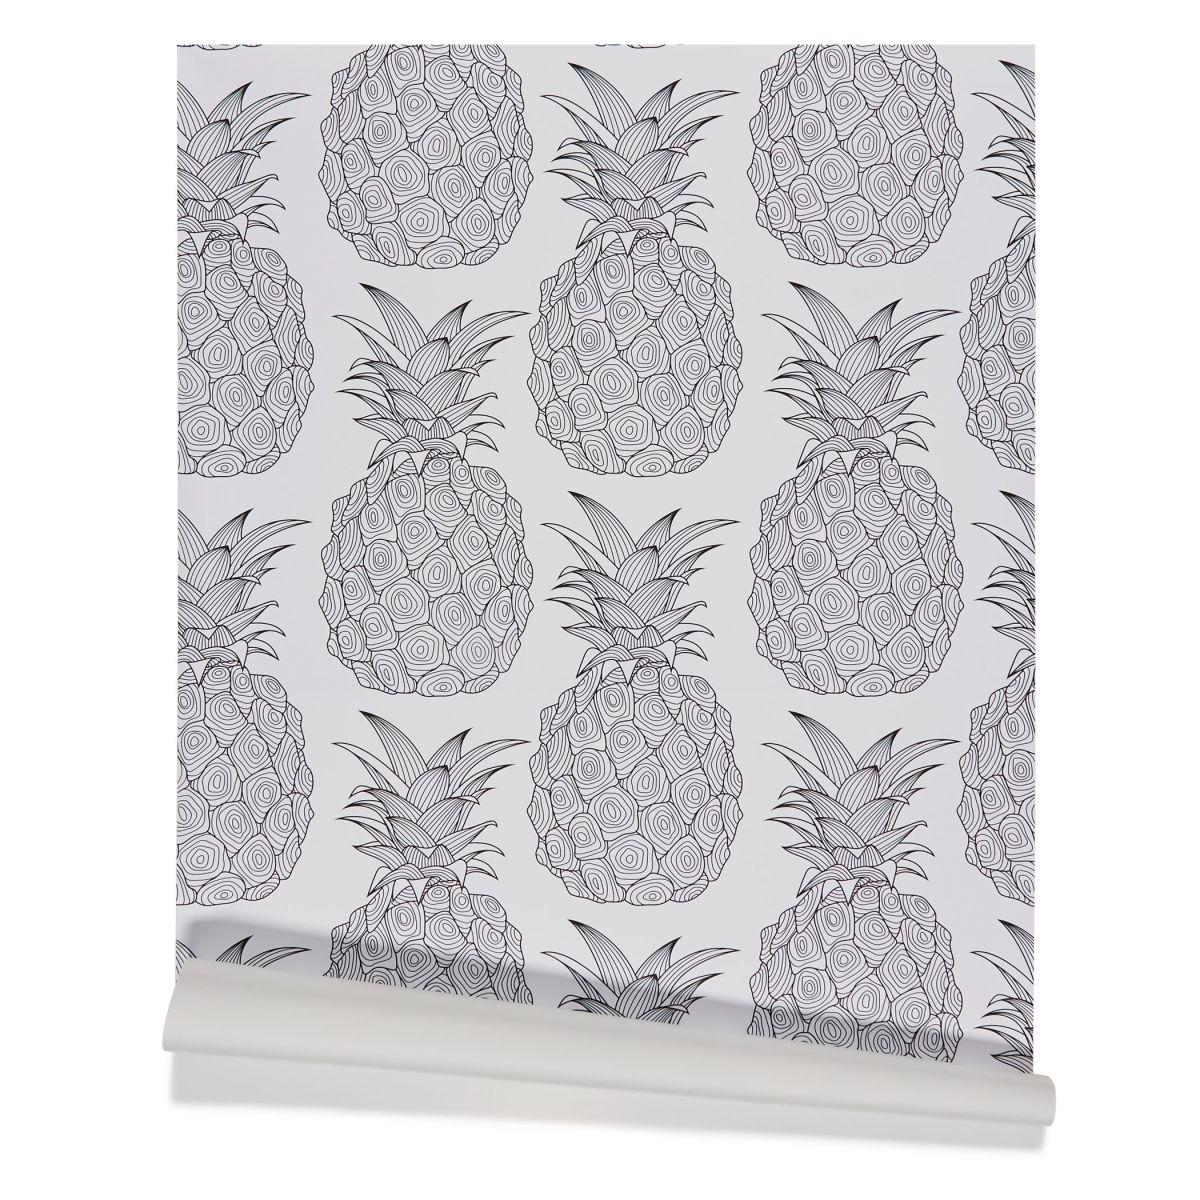 Tapete Ananas, selbstklebend, modern, Vinyl